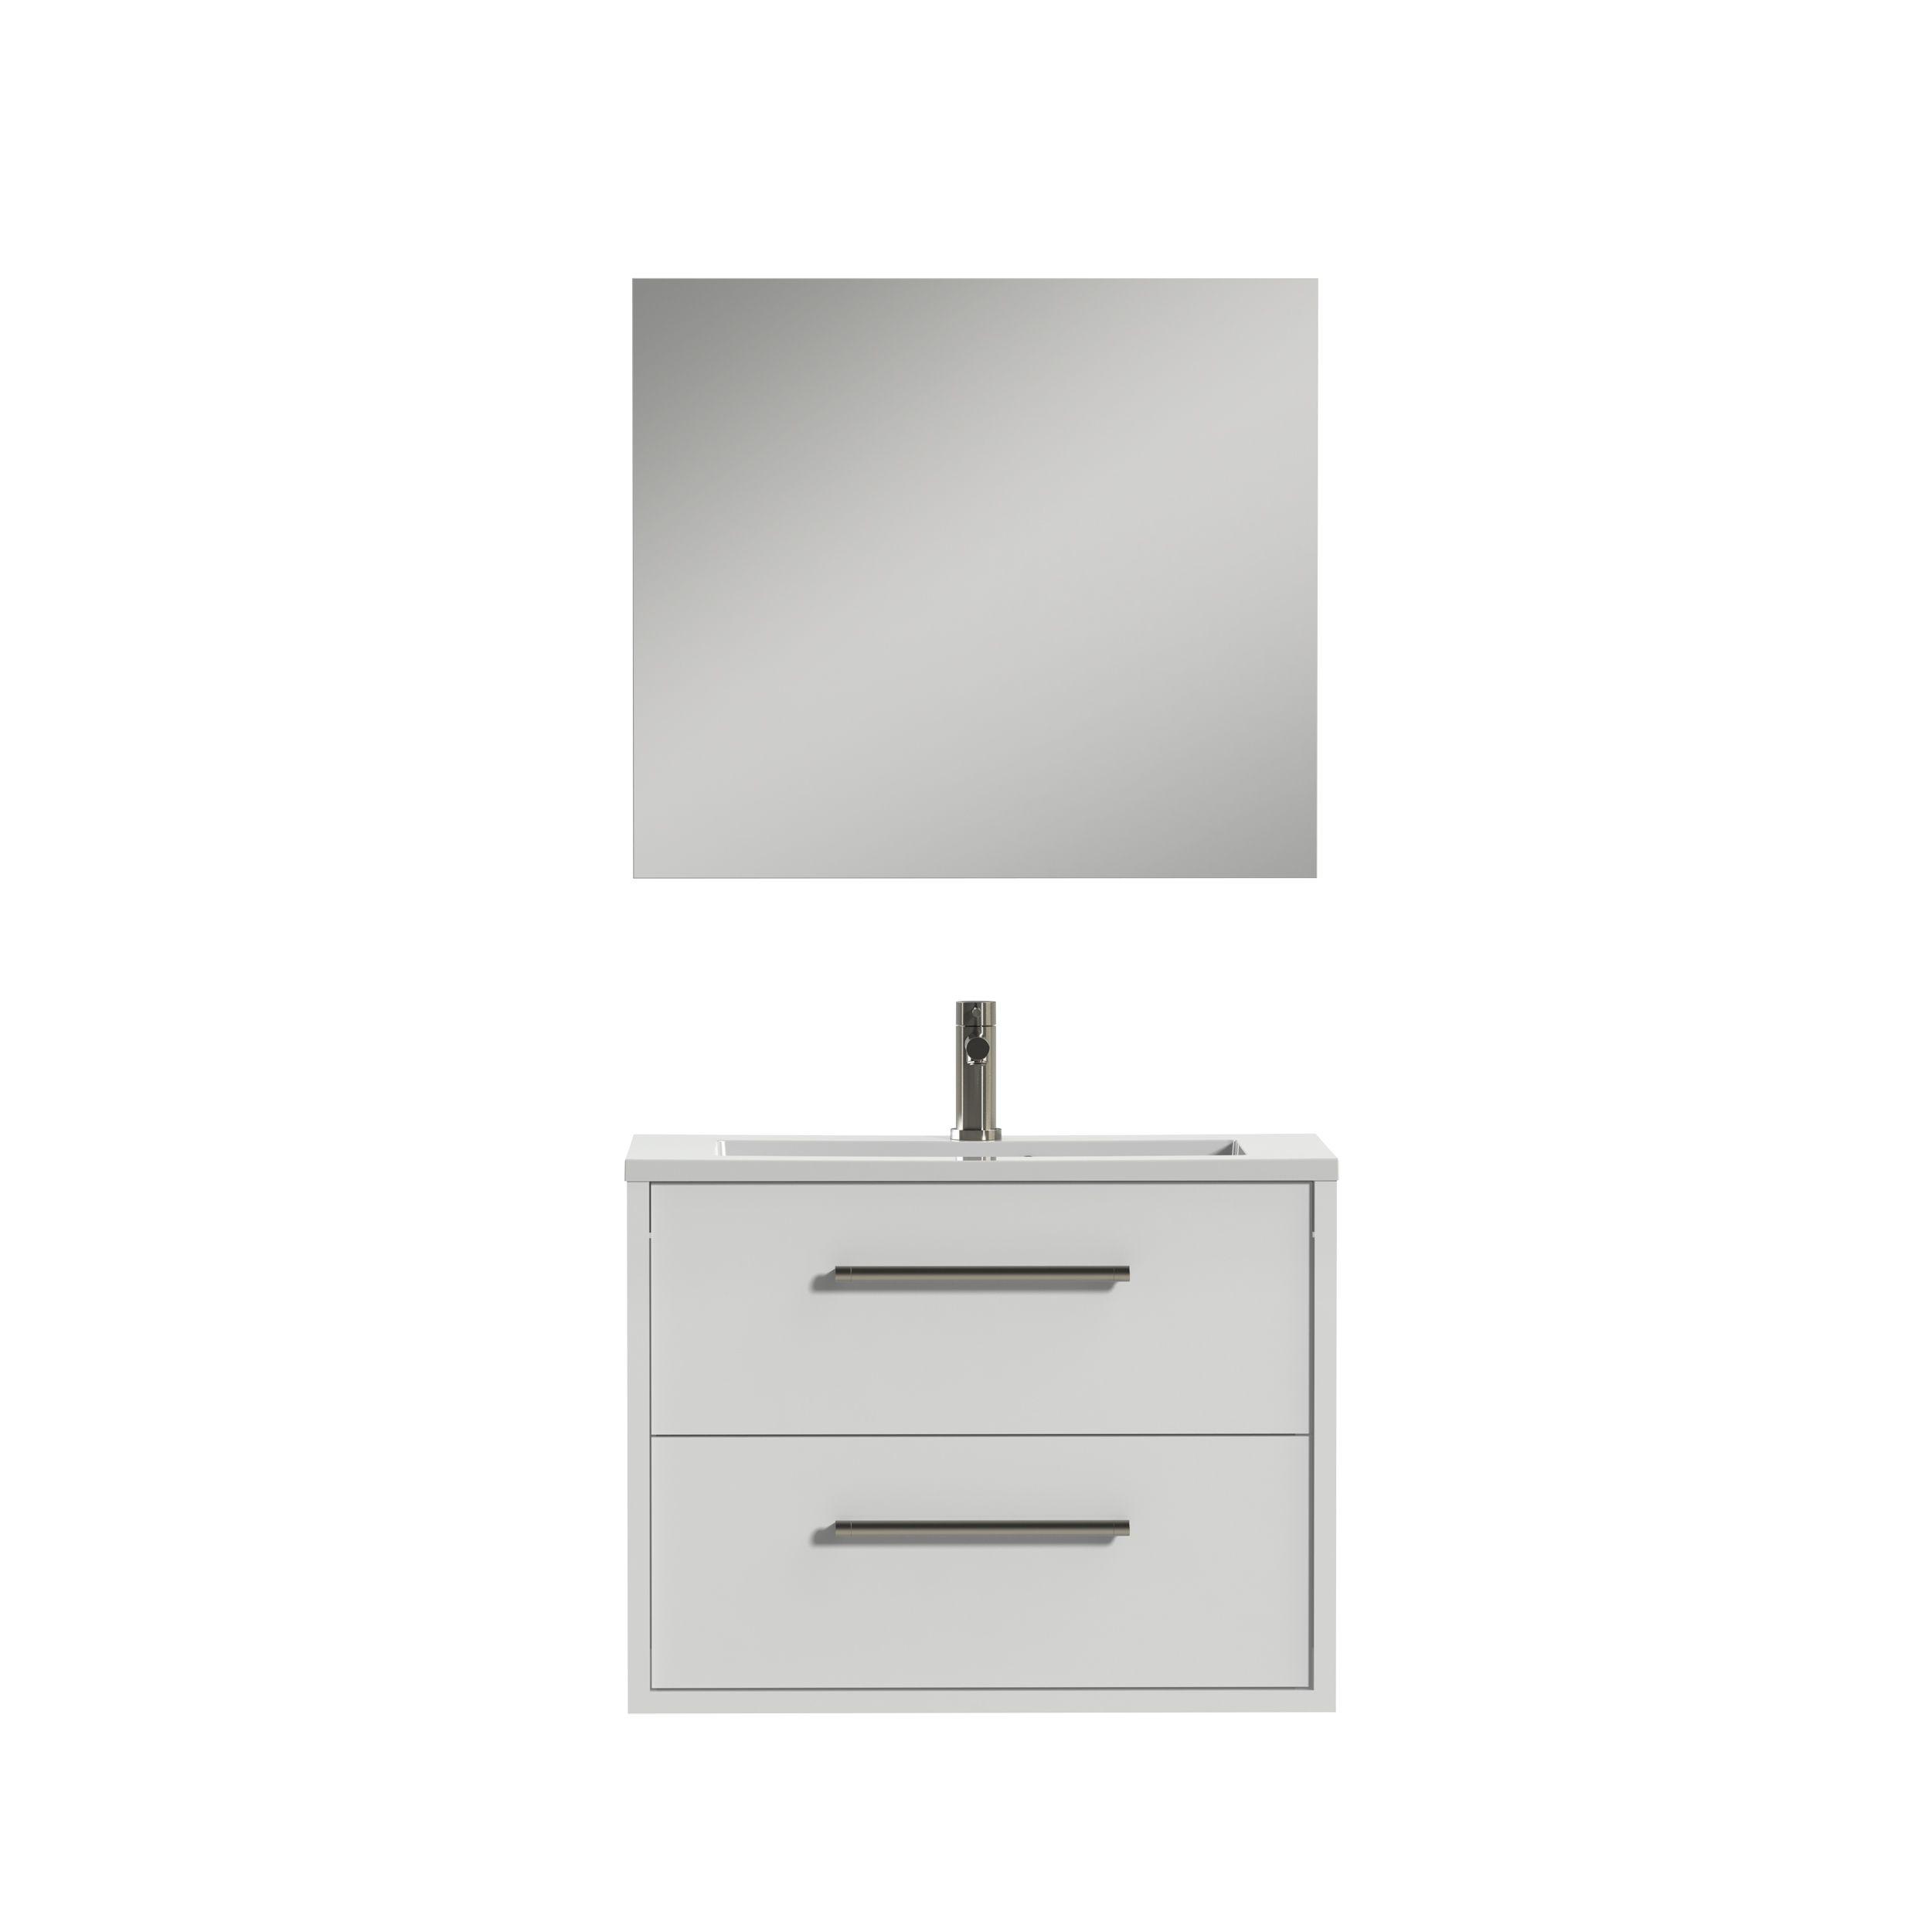 Tiger Boston badmeubelset incl spiegel en witte wastafel 80cm wit